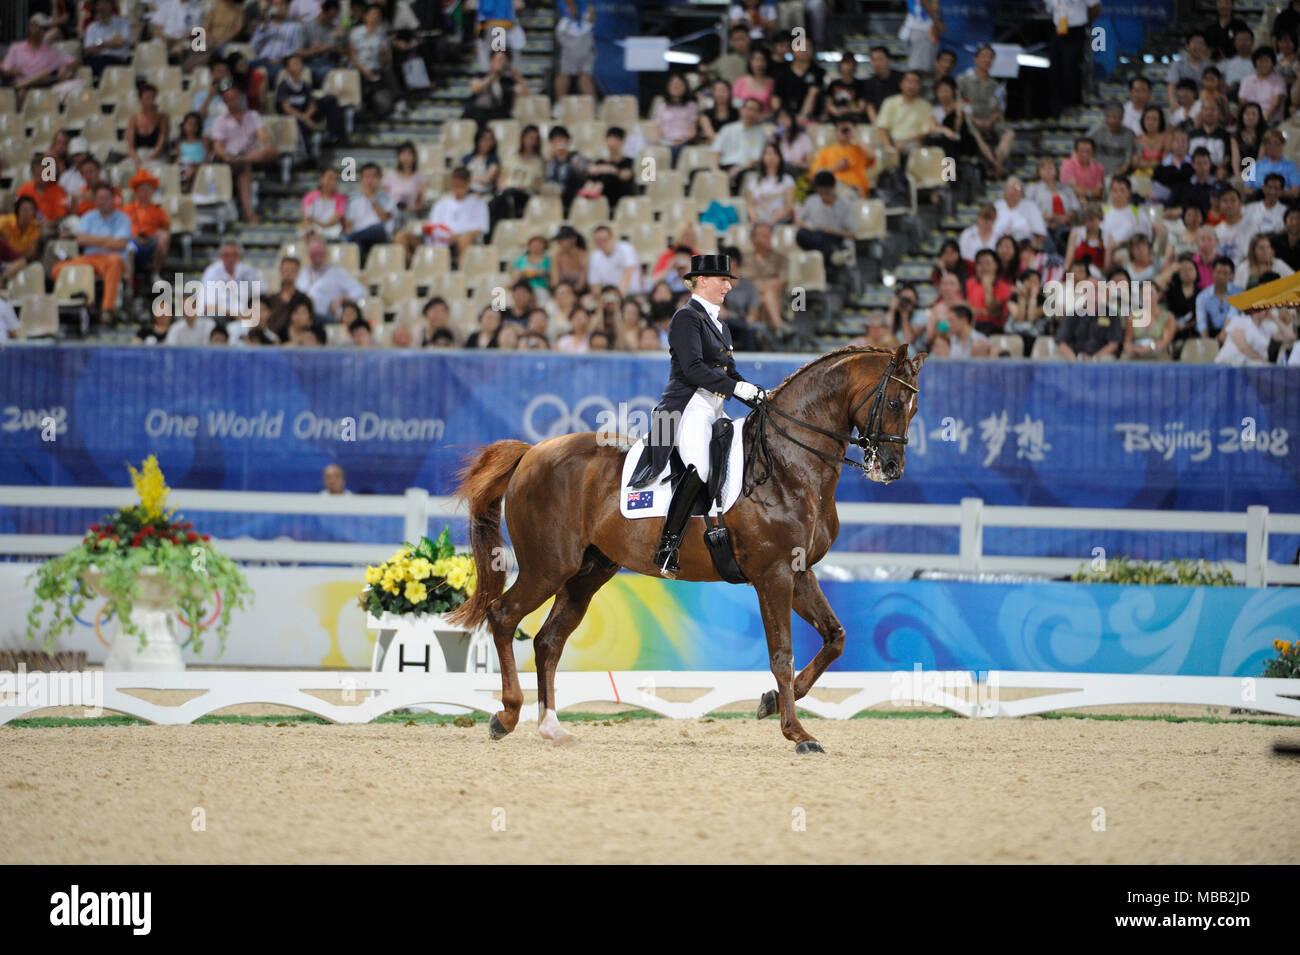 Olympic Games 2008, Hong Kong (Beijing Games) August 2008, Kristy Oatley-Nist (AUS) riding Quando-Quando, Dressage Grand Prix - Stock Image